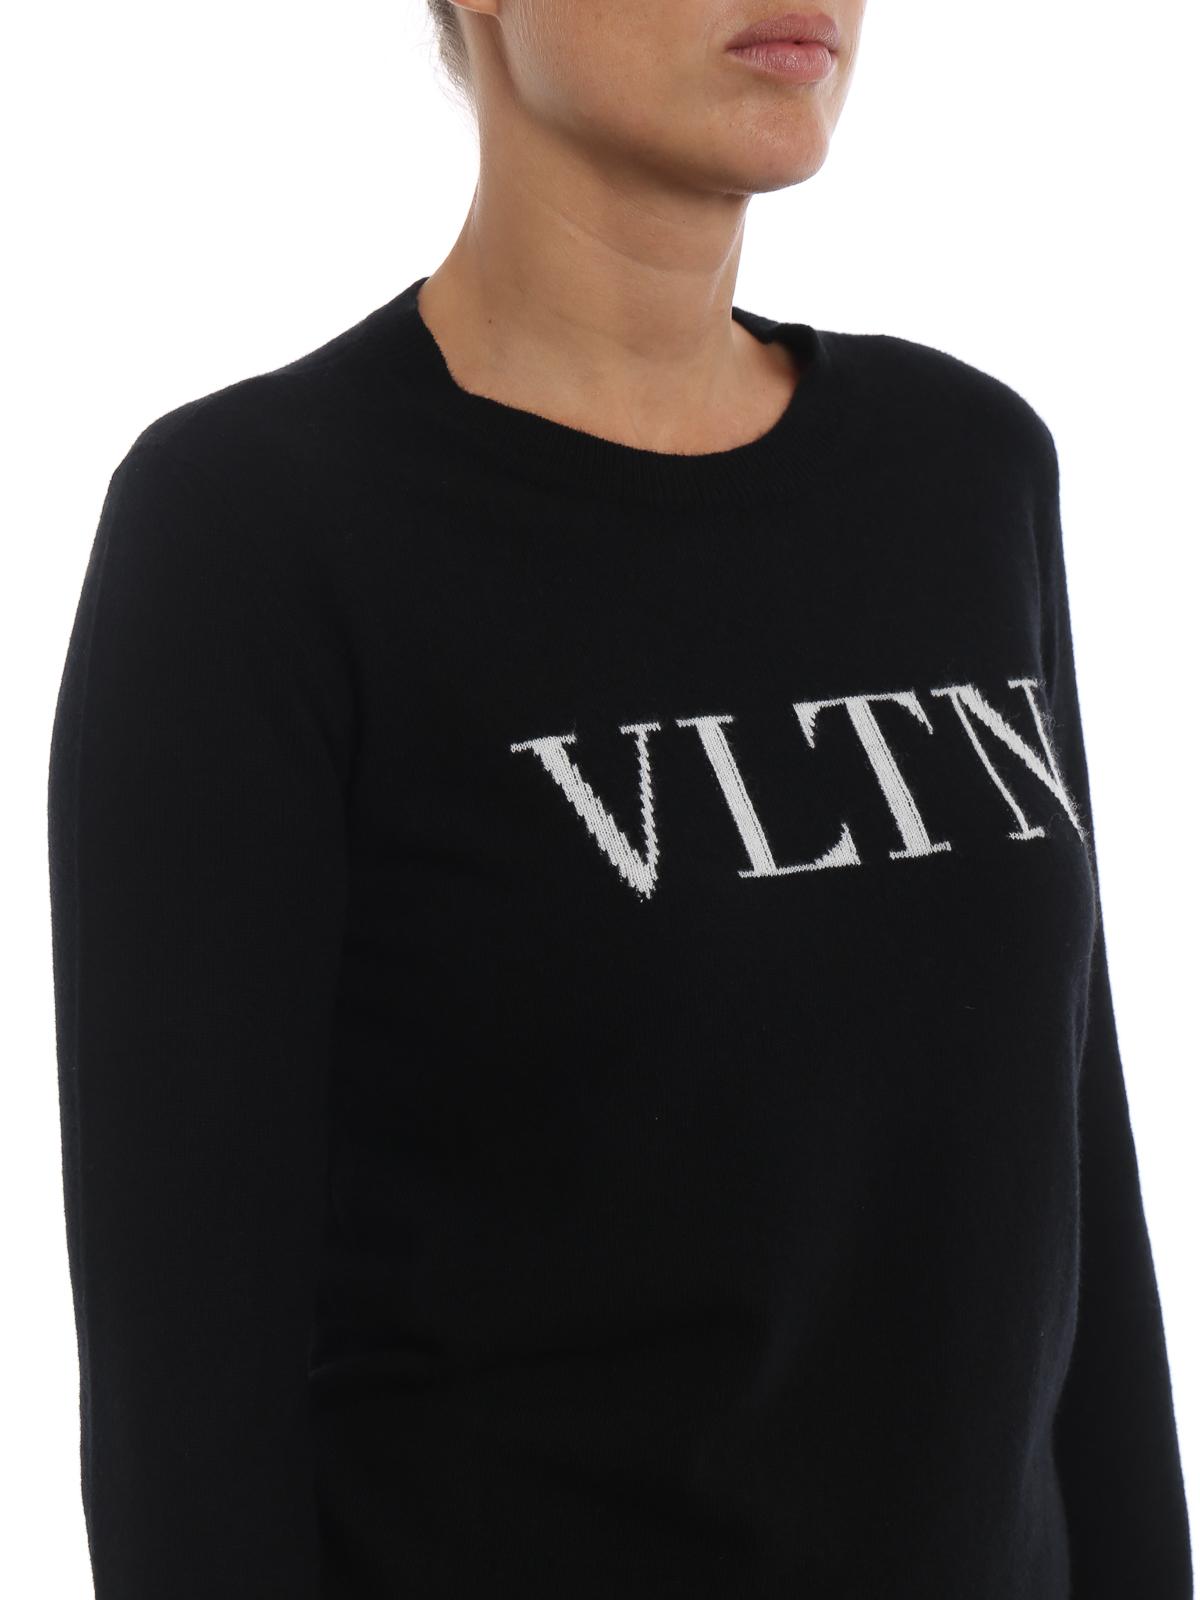 e6af18b1a0171 Valentino - VLTN intarsia wool and cashmere sweater - crew necks ...